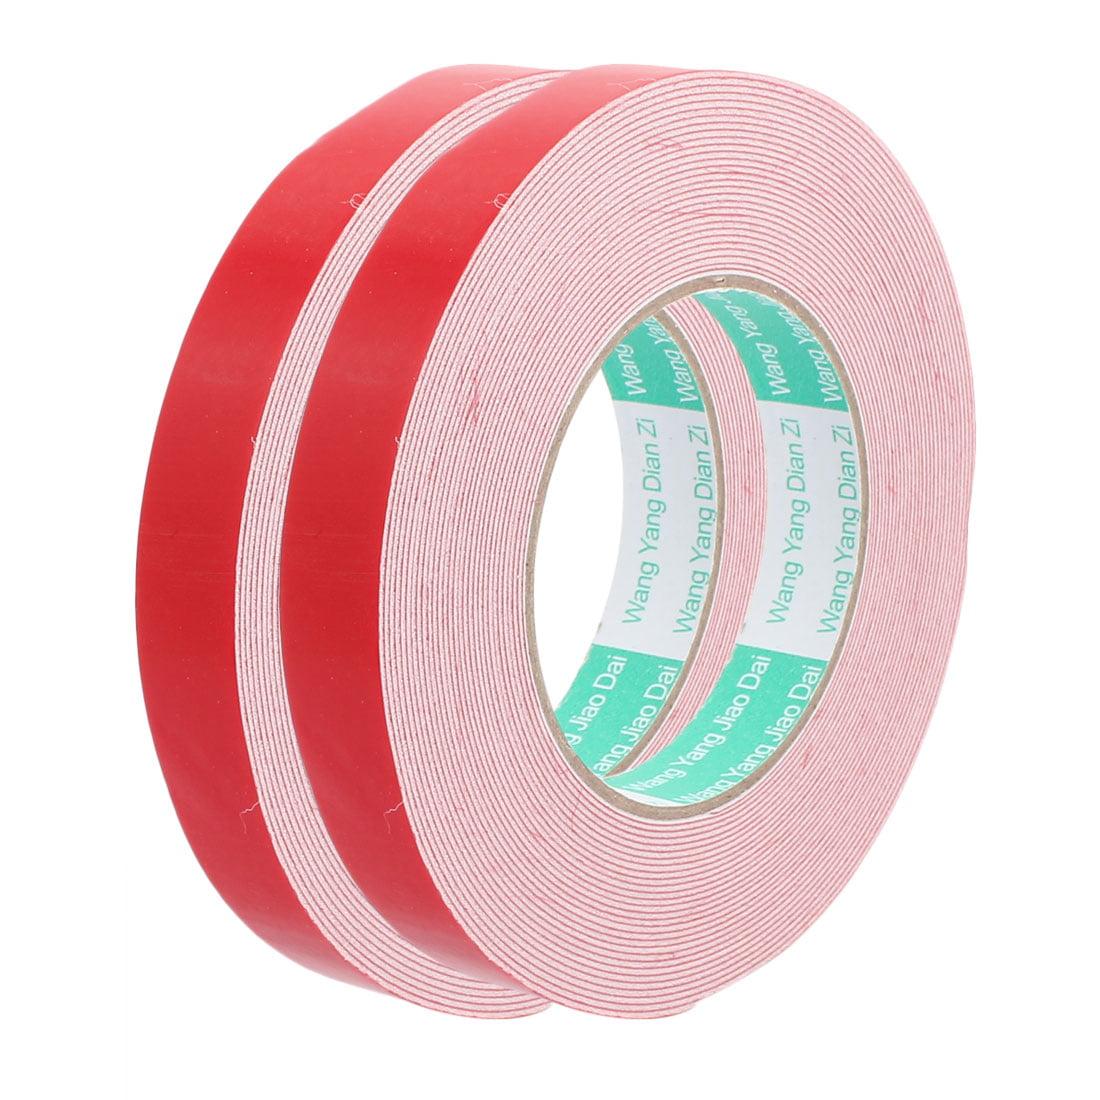 2pcs 10M 20mm x 1mm Dual-side Adhesive Shockproof Sponge EVA Tape Red White